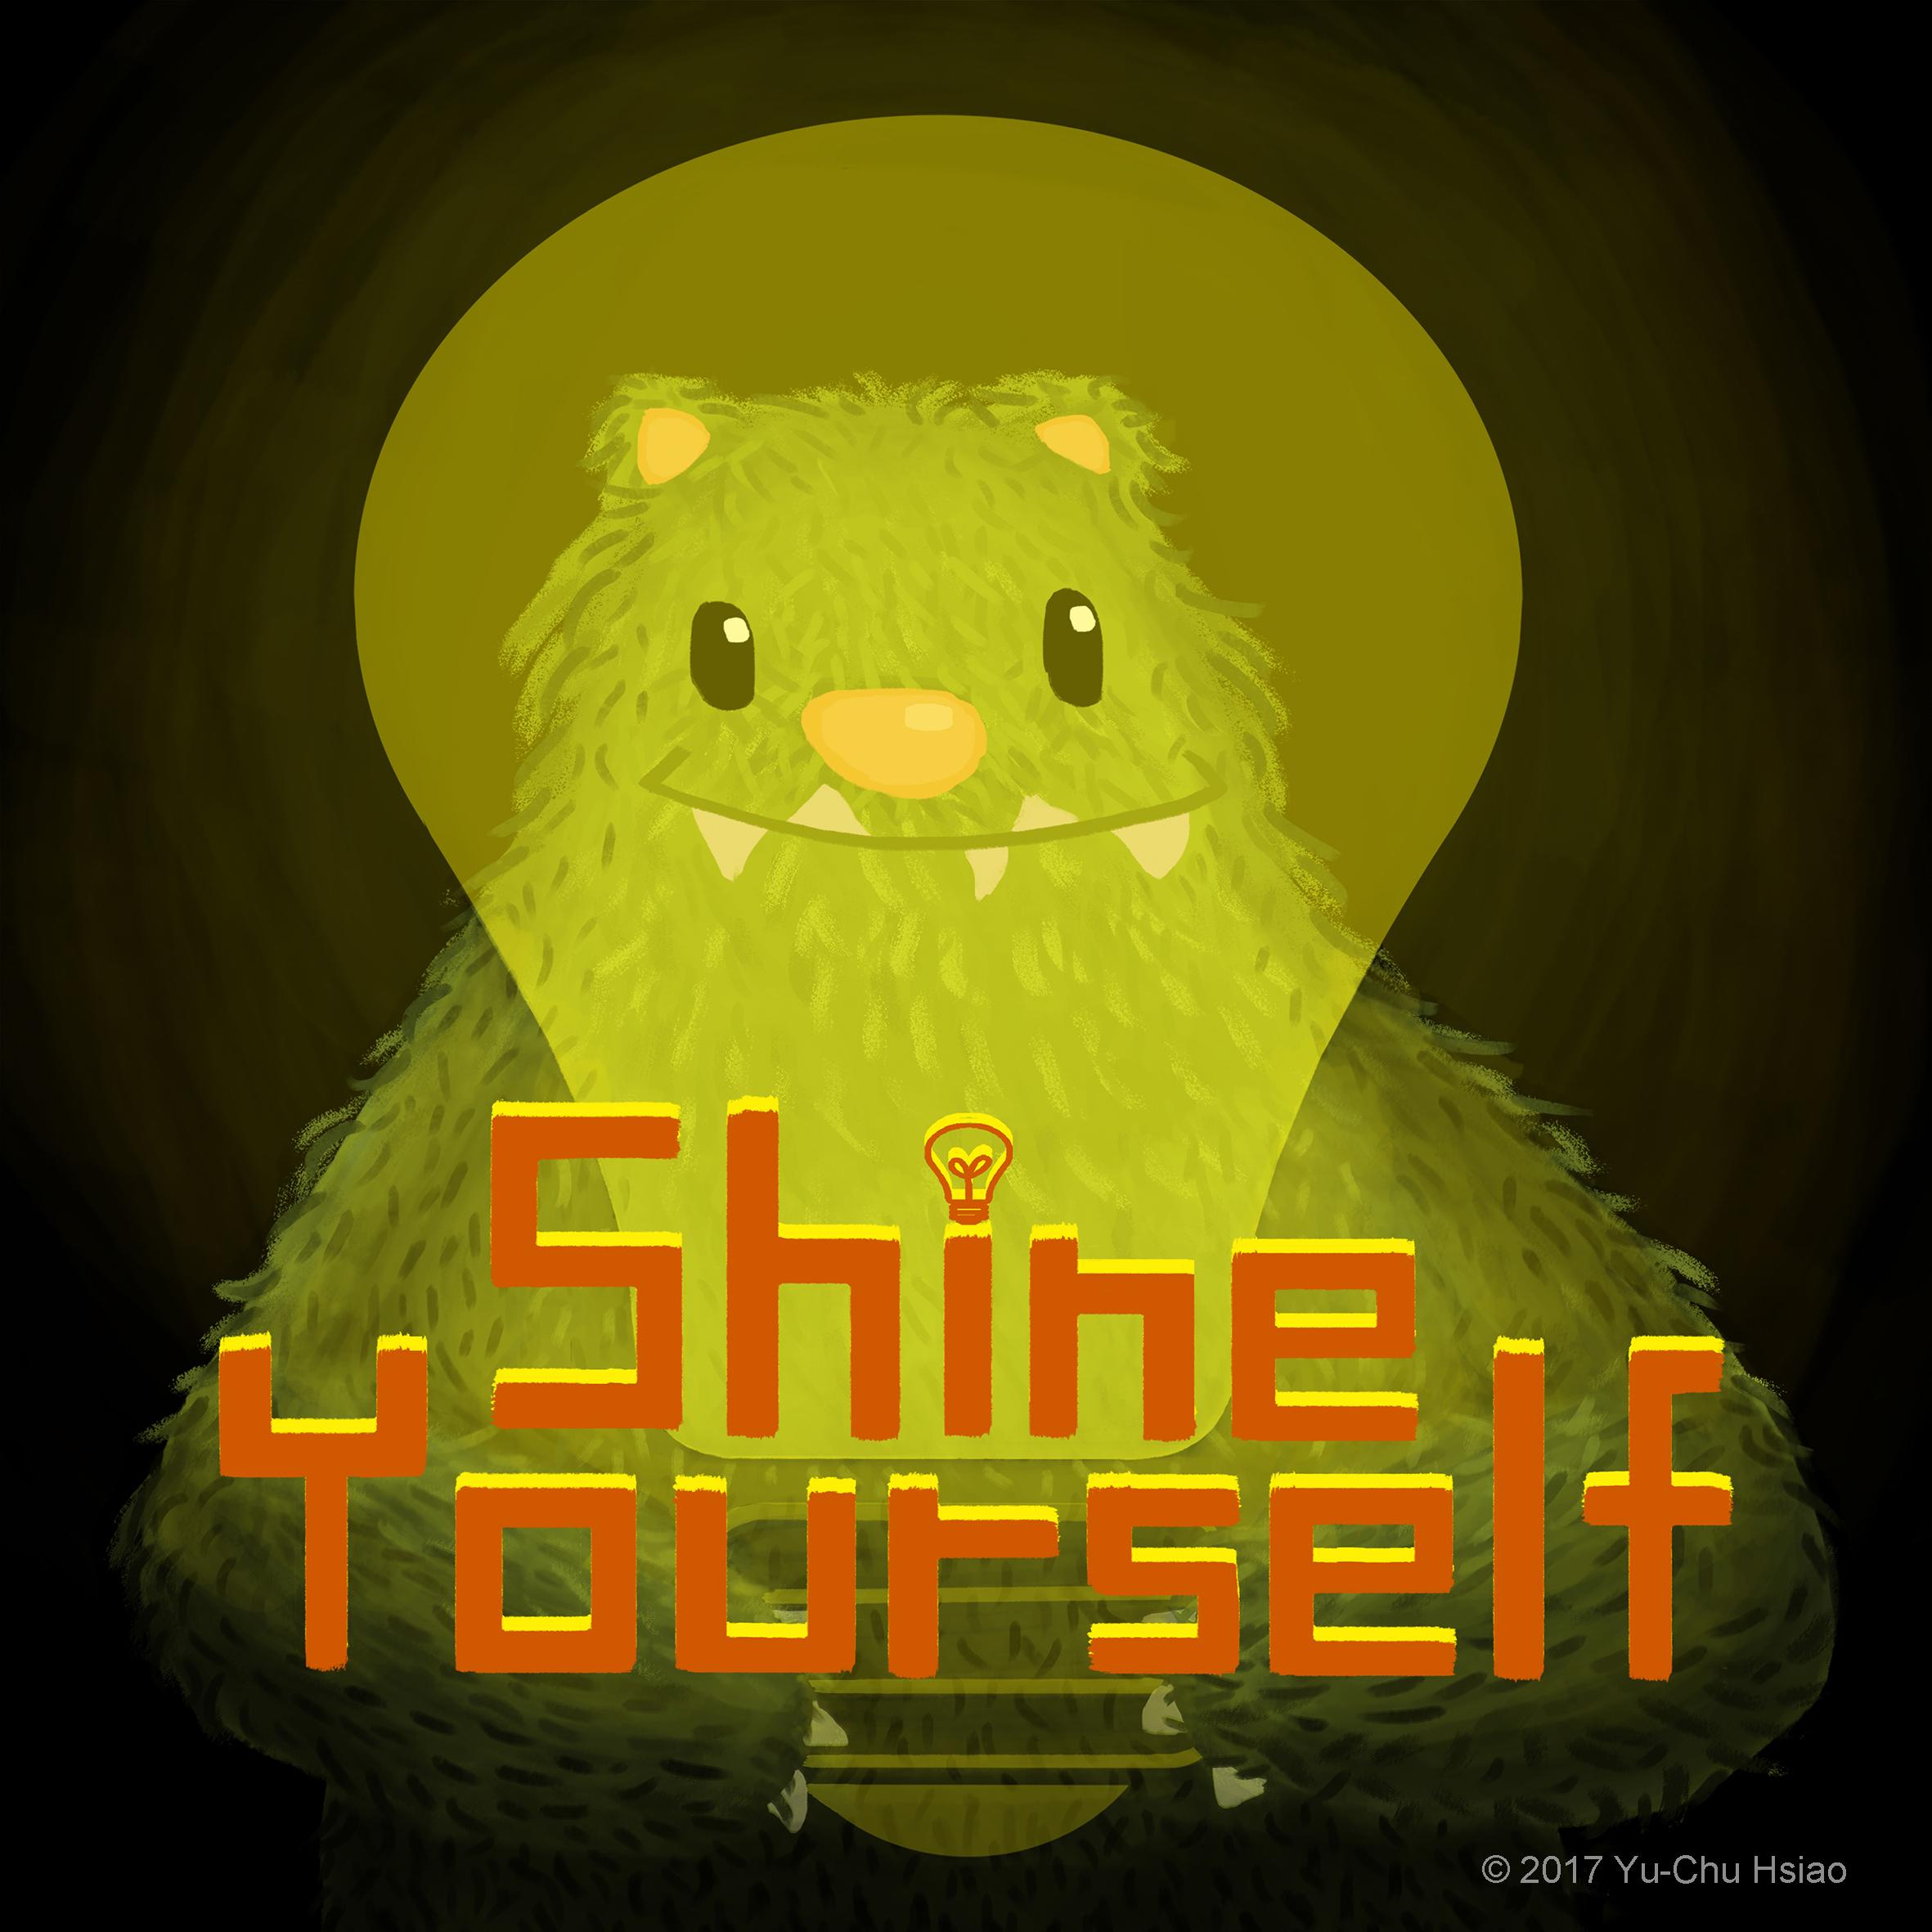 Web_Shine Yourself(RGB)_12.24.jpg